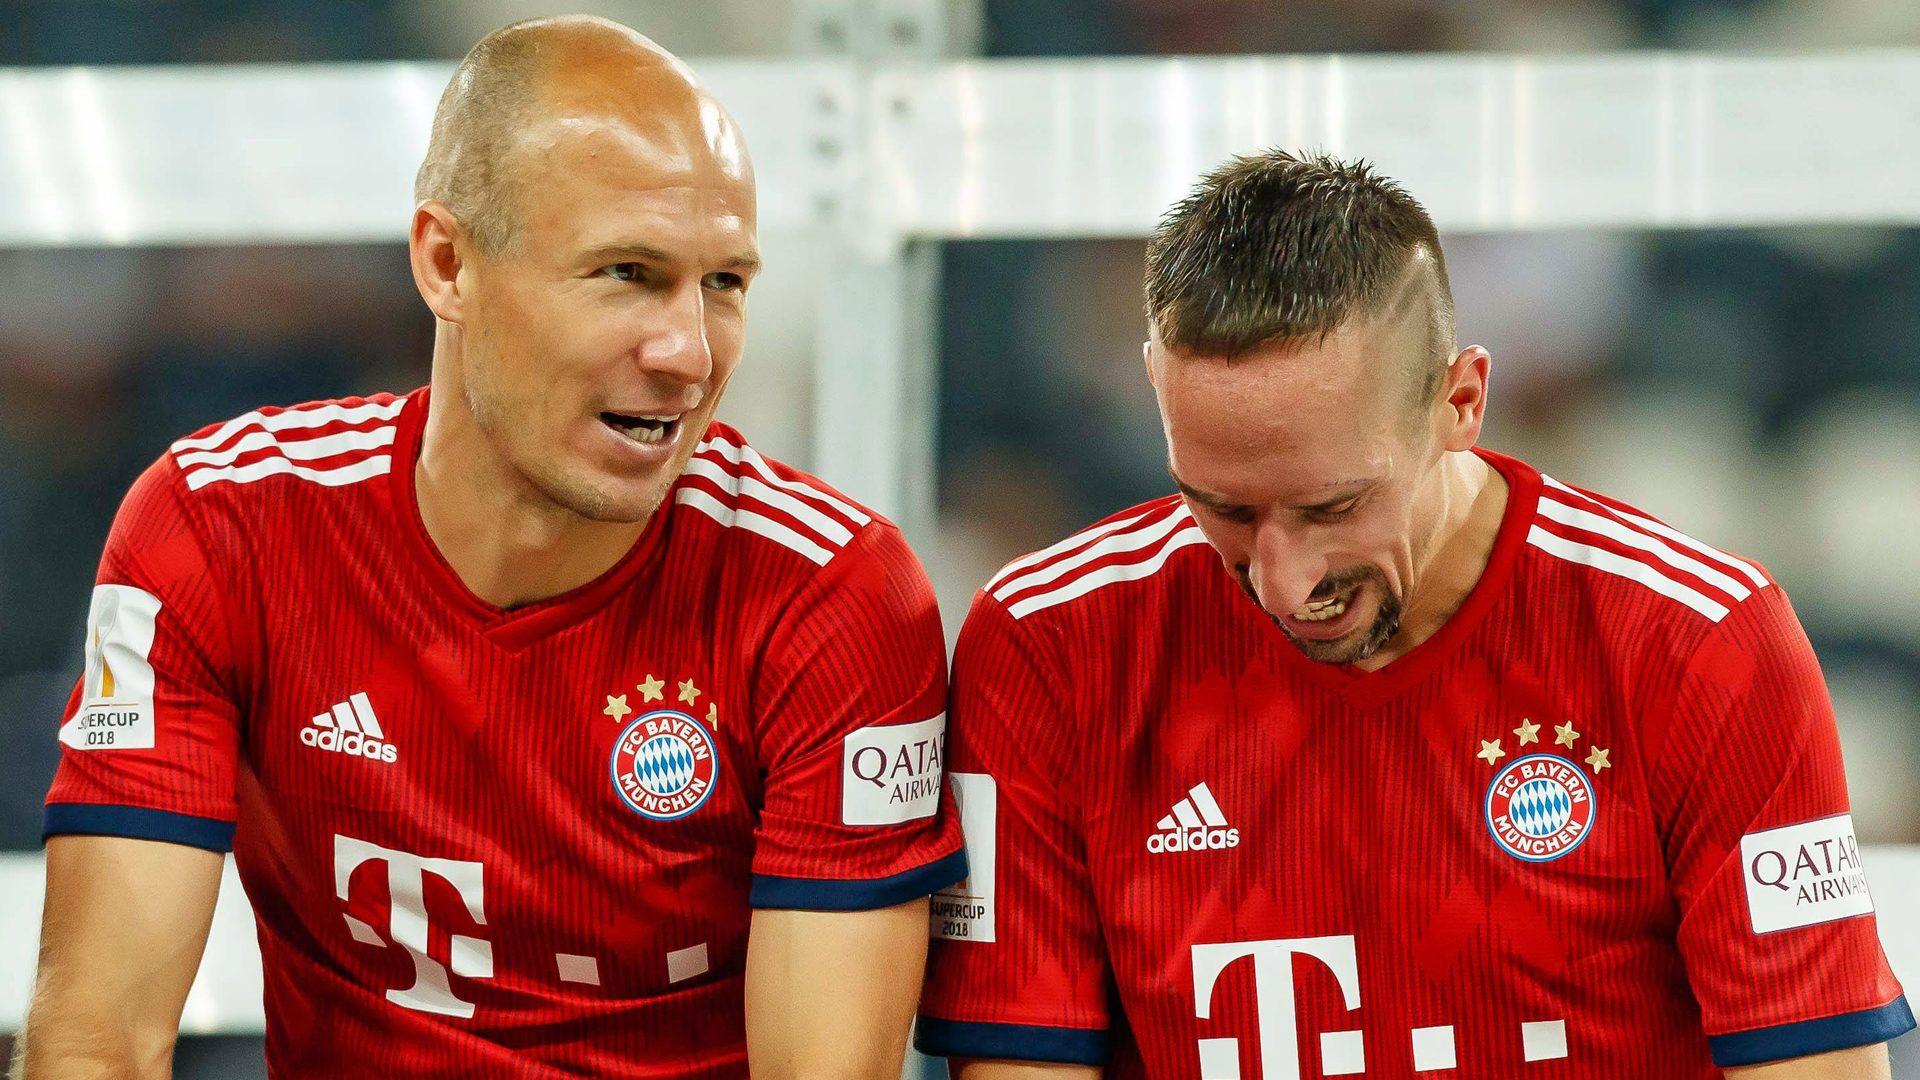 Bundesliga | Bayern Munich's Arjen Robben and Franck Ribery: An ...